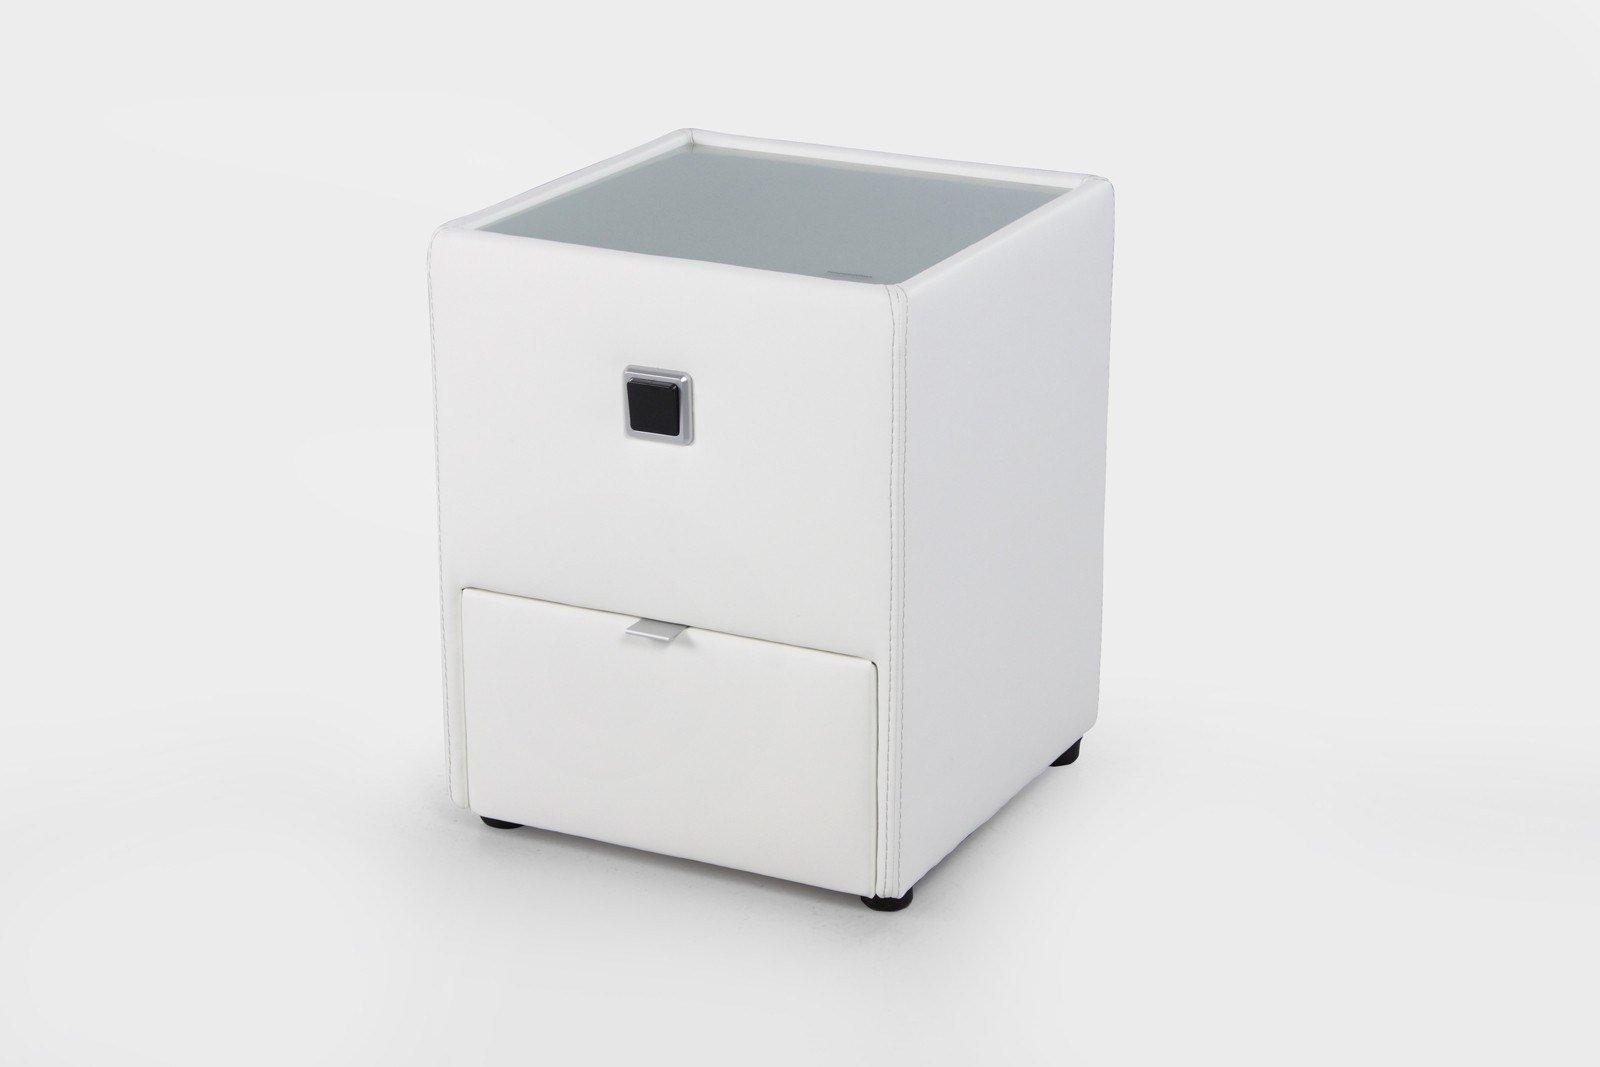 jockenh fer olbia boxspringbett in anthrazit wei m bel. Black Bedroom Furniture Sets. Home Design Ideas